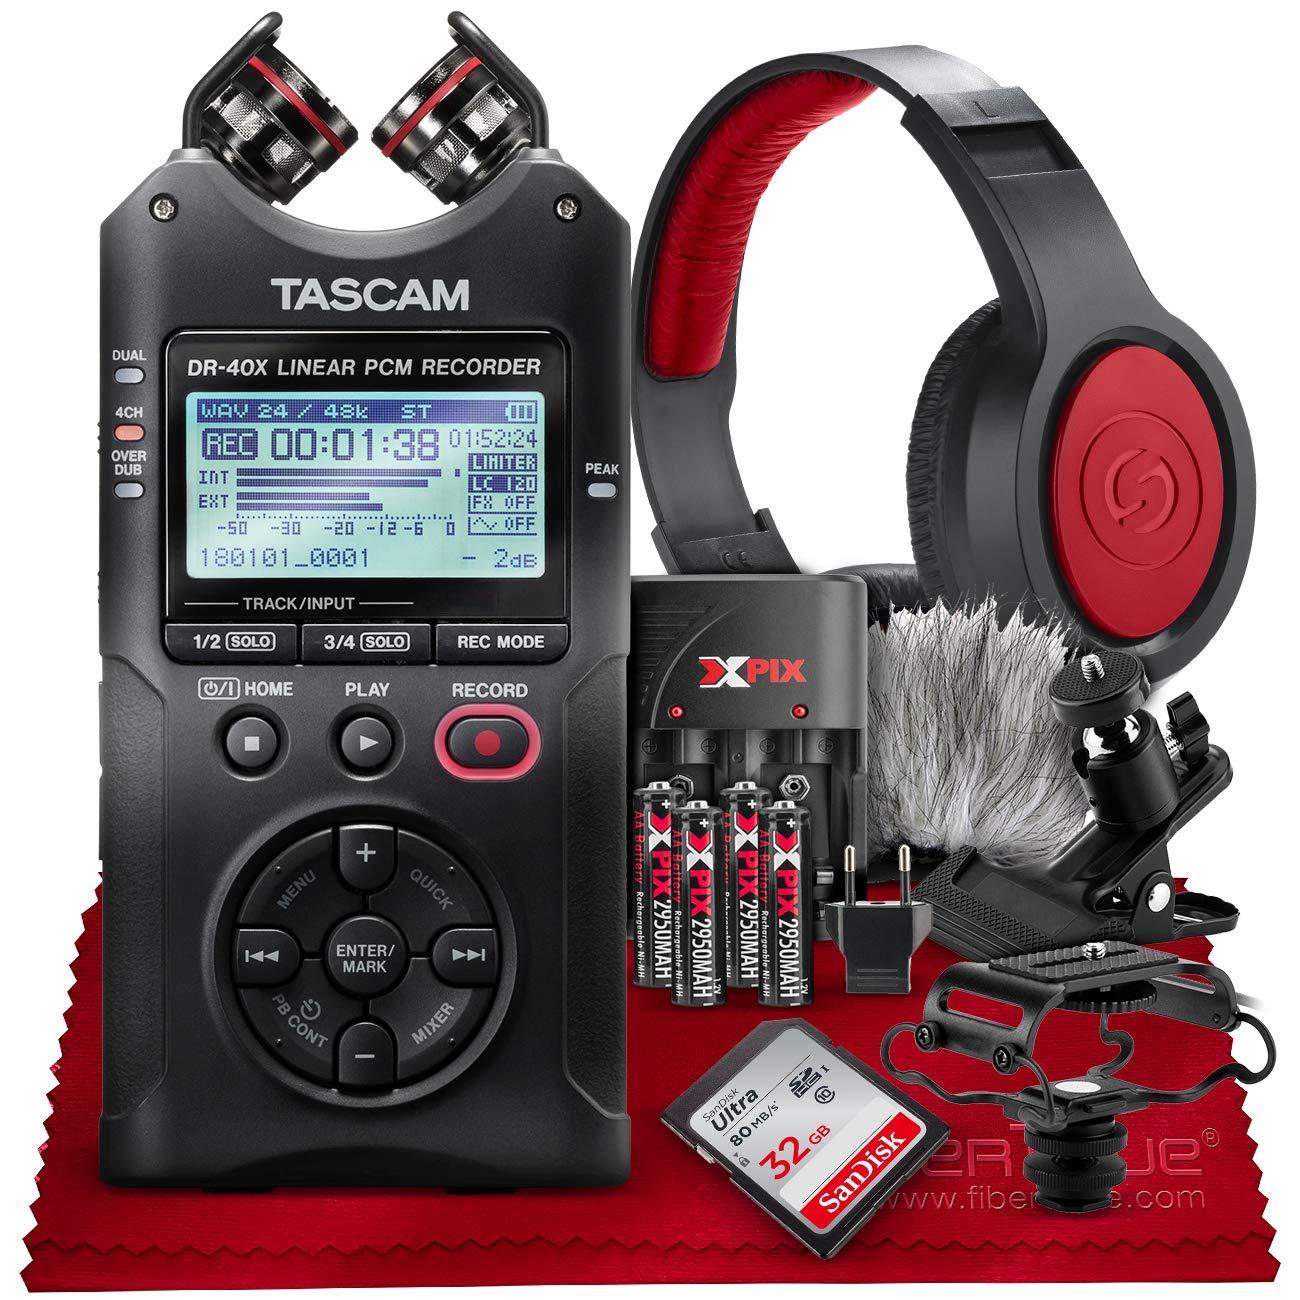 Tascam DR-40X Four-Track Digital Audio Recorder and USB Audio Interface + 32GB + Samson Headphones + Batteries + Accessories Bundle